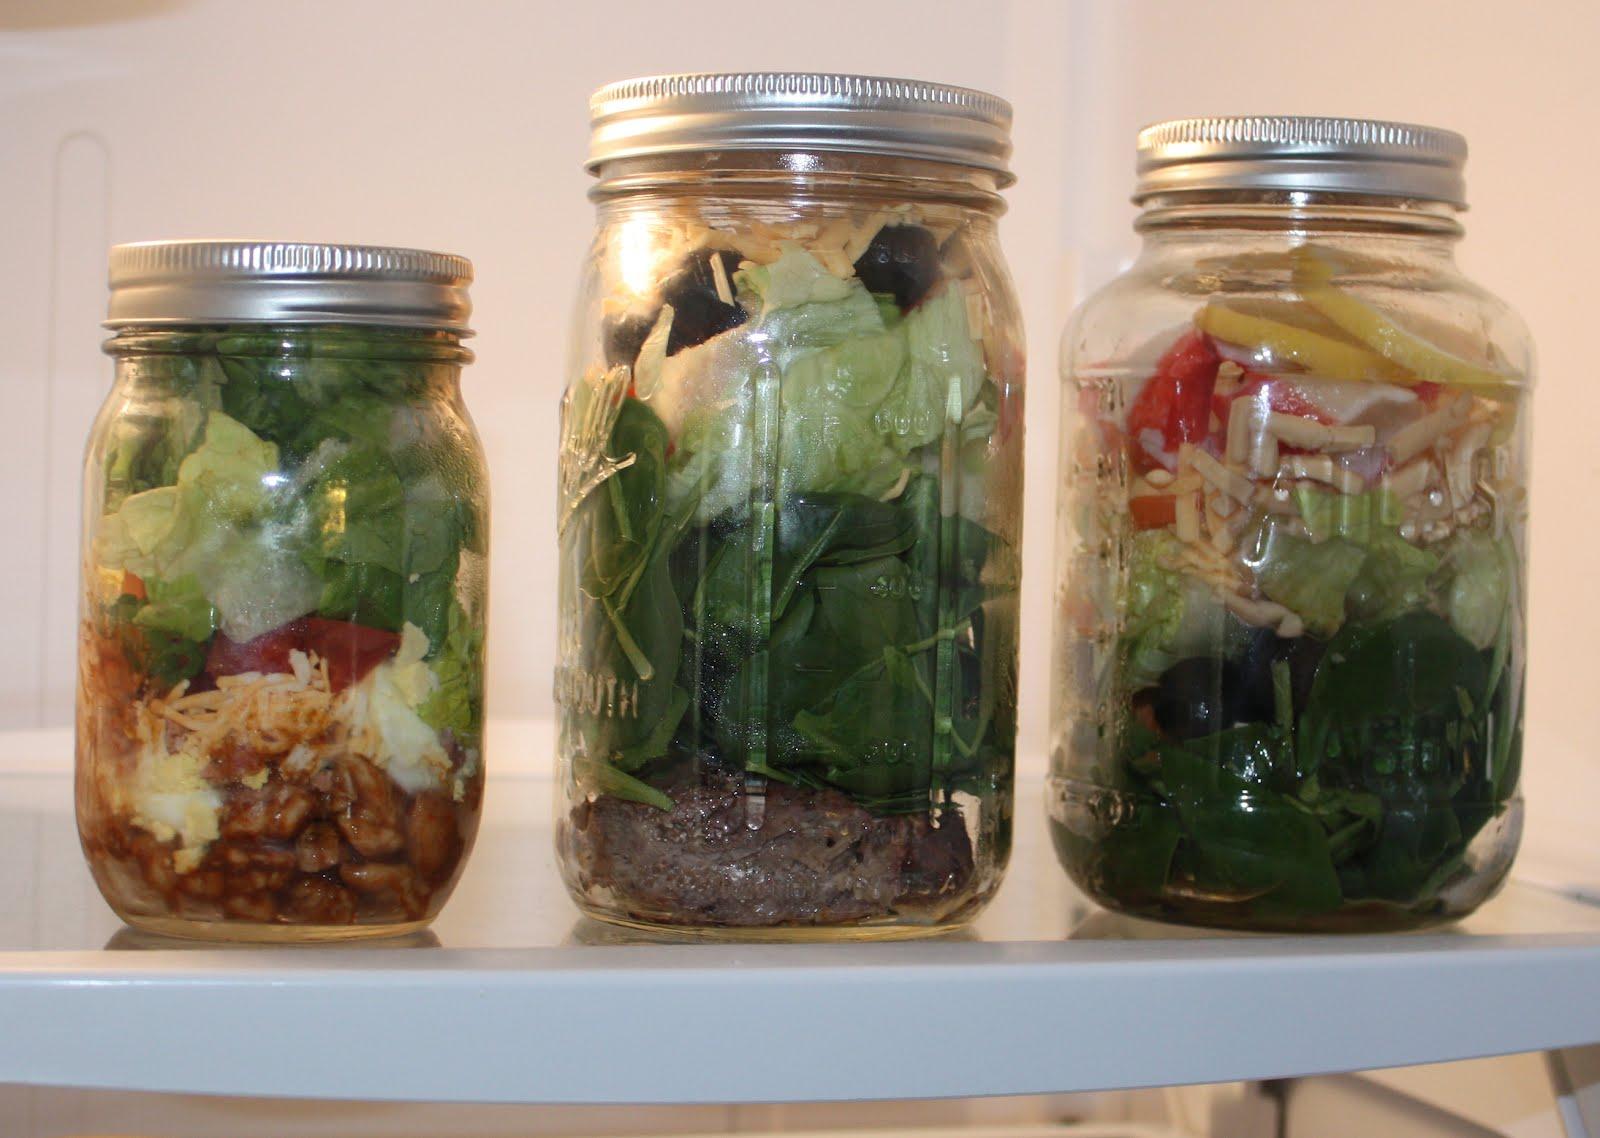 how to keep pre made salad fresh